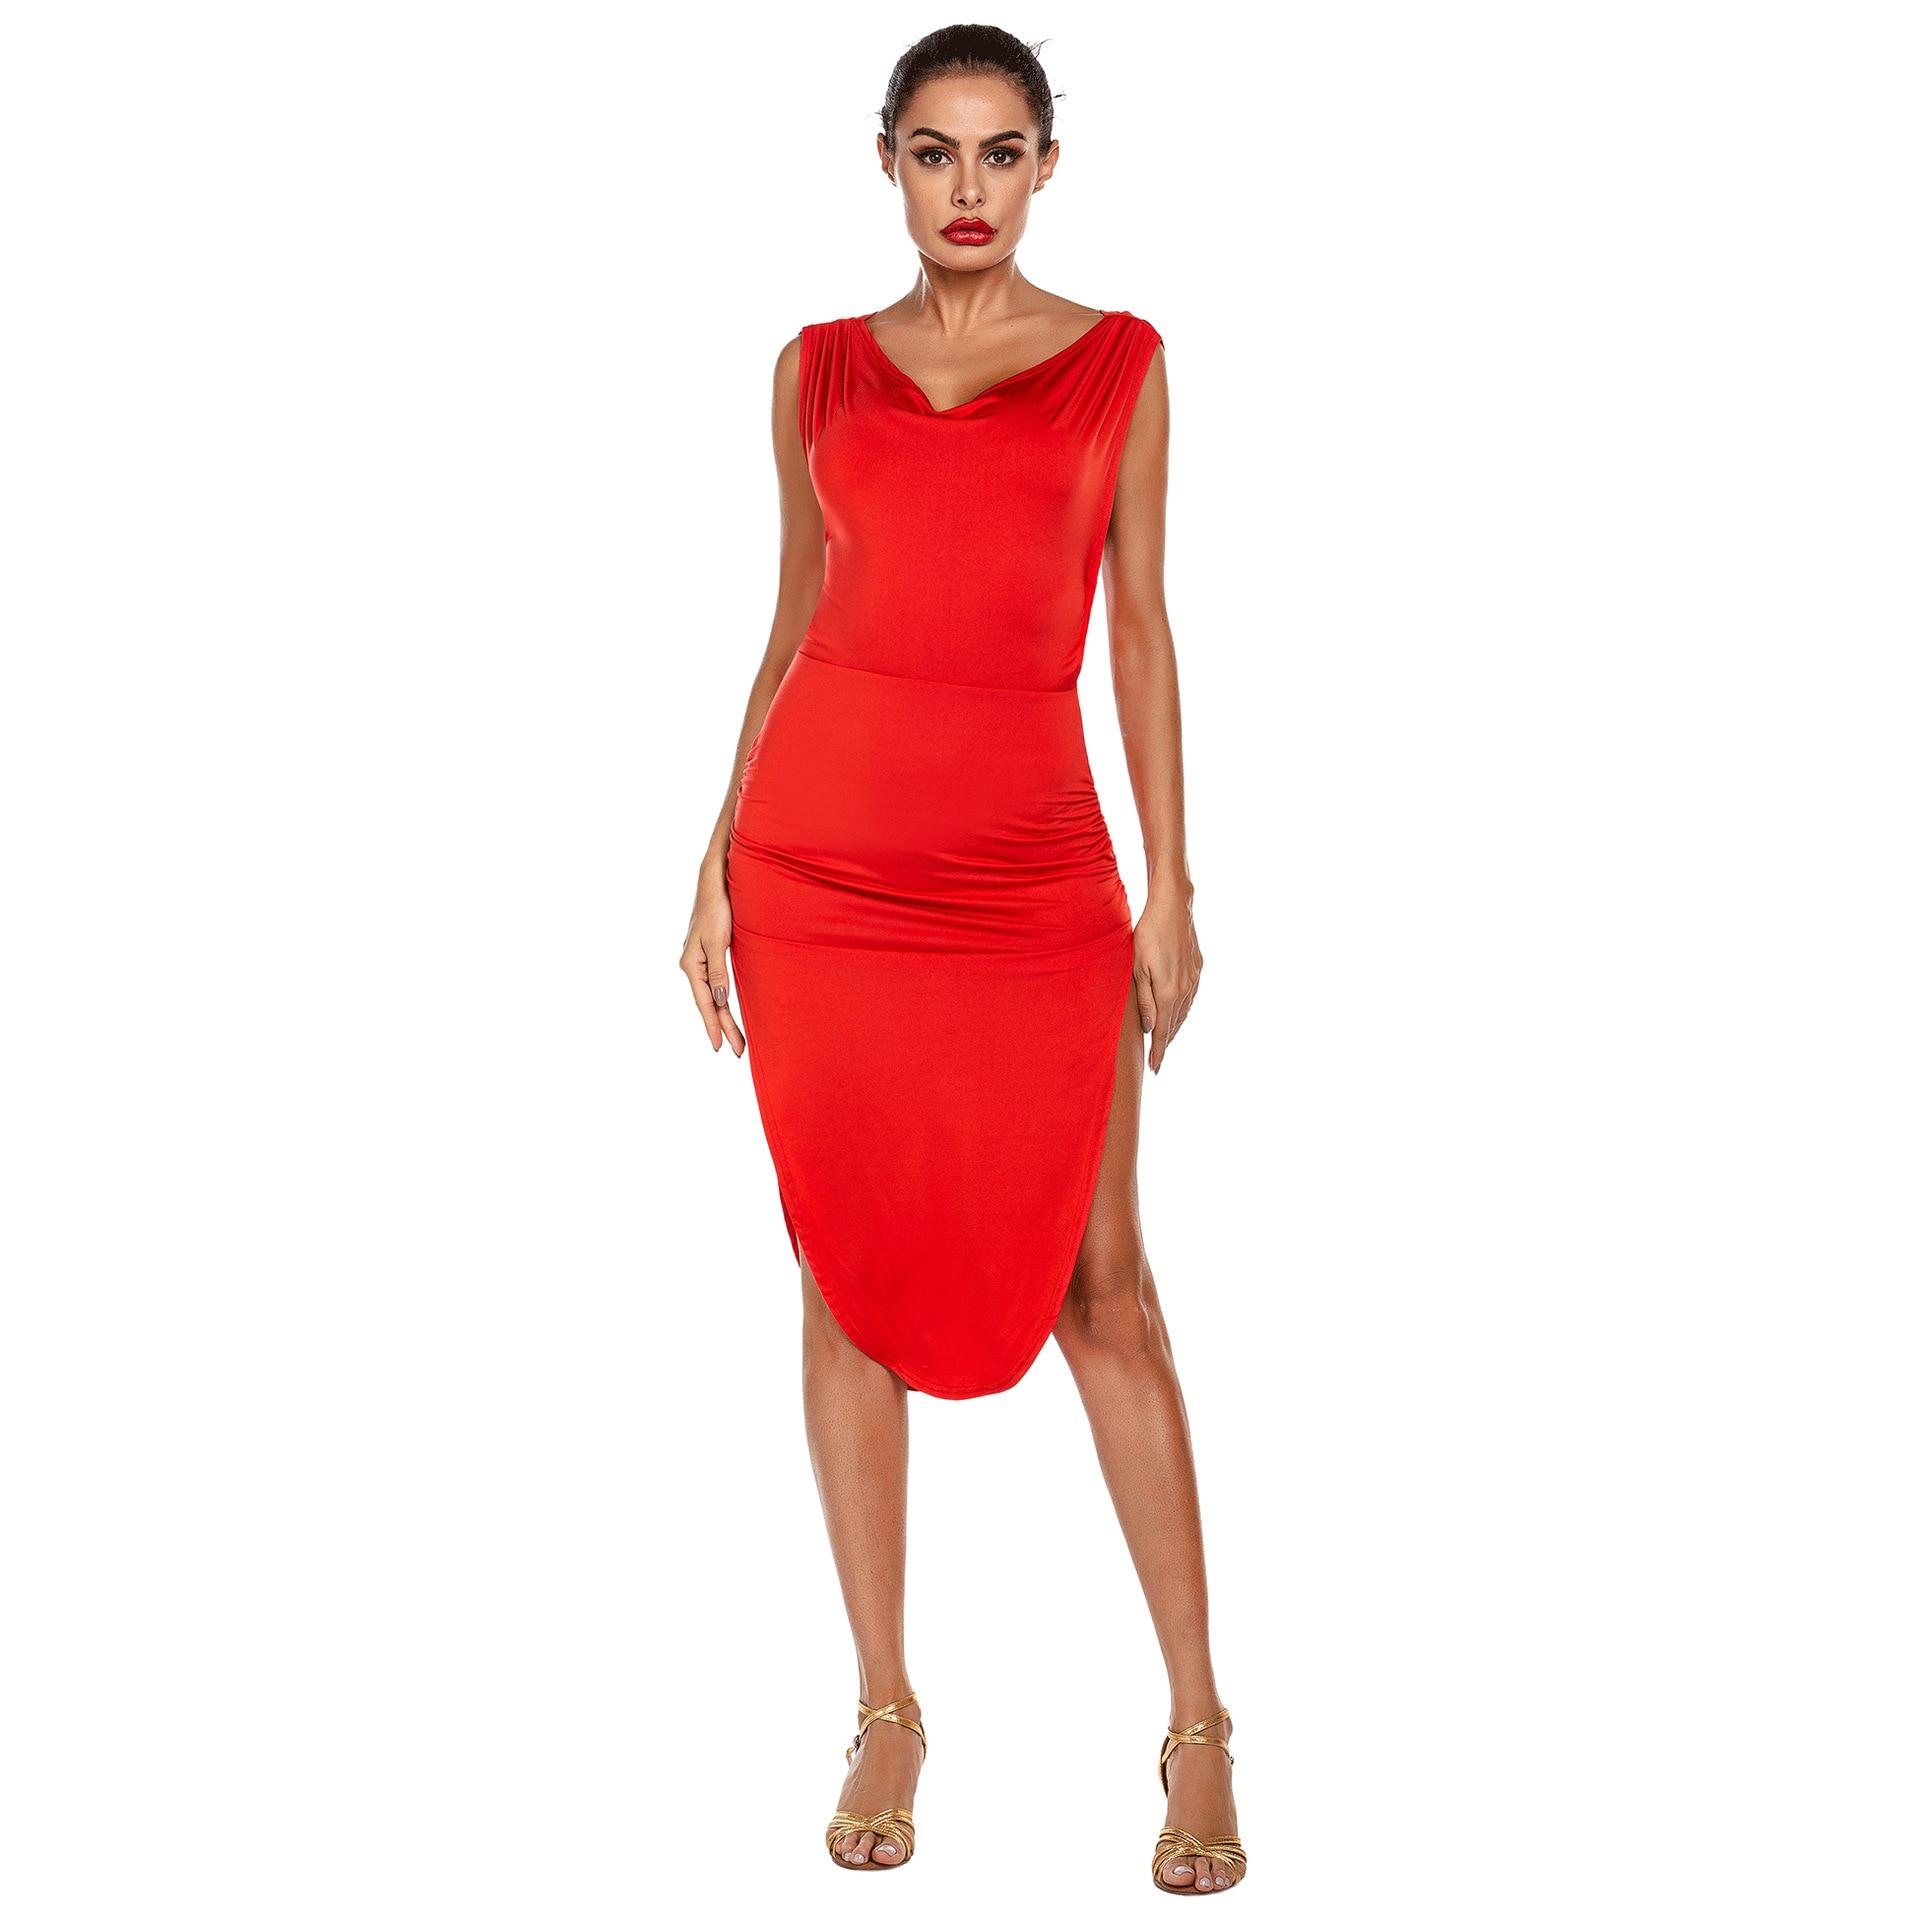 Hot Sale Woman Dance Costume Red Split Latin Dance Dress Adult Dance Dress High Quality XS-XL Drop Shipping